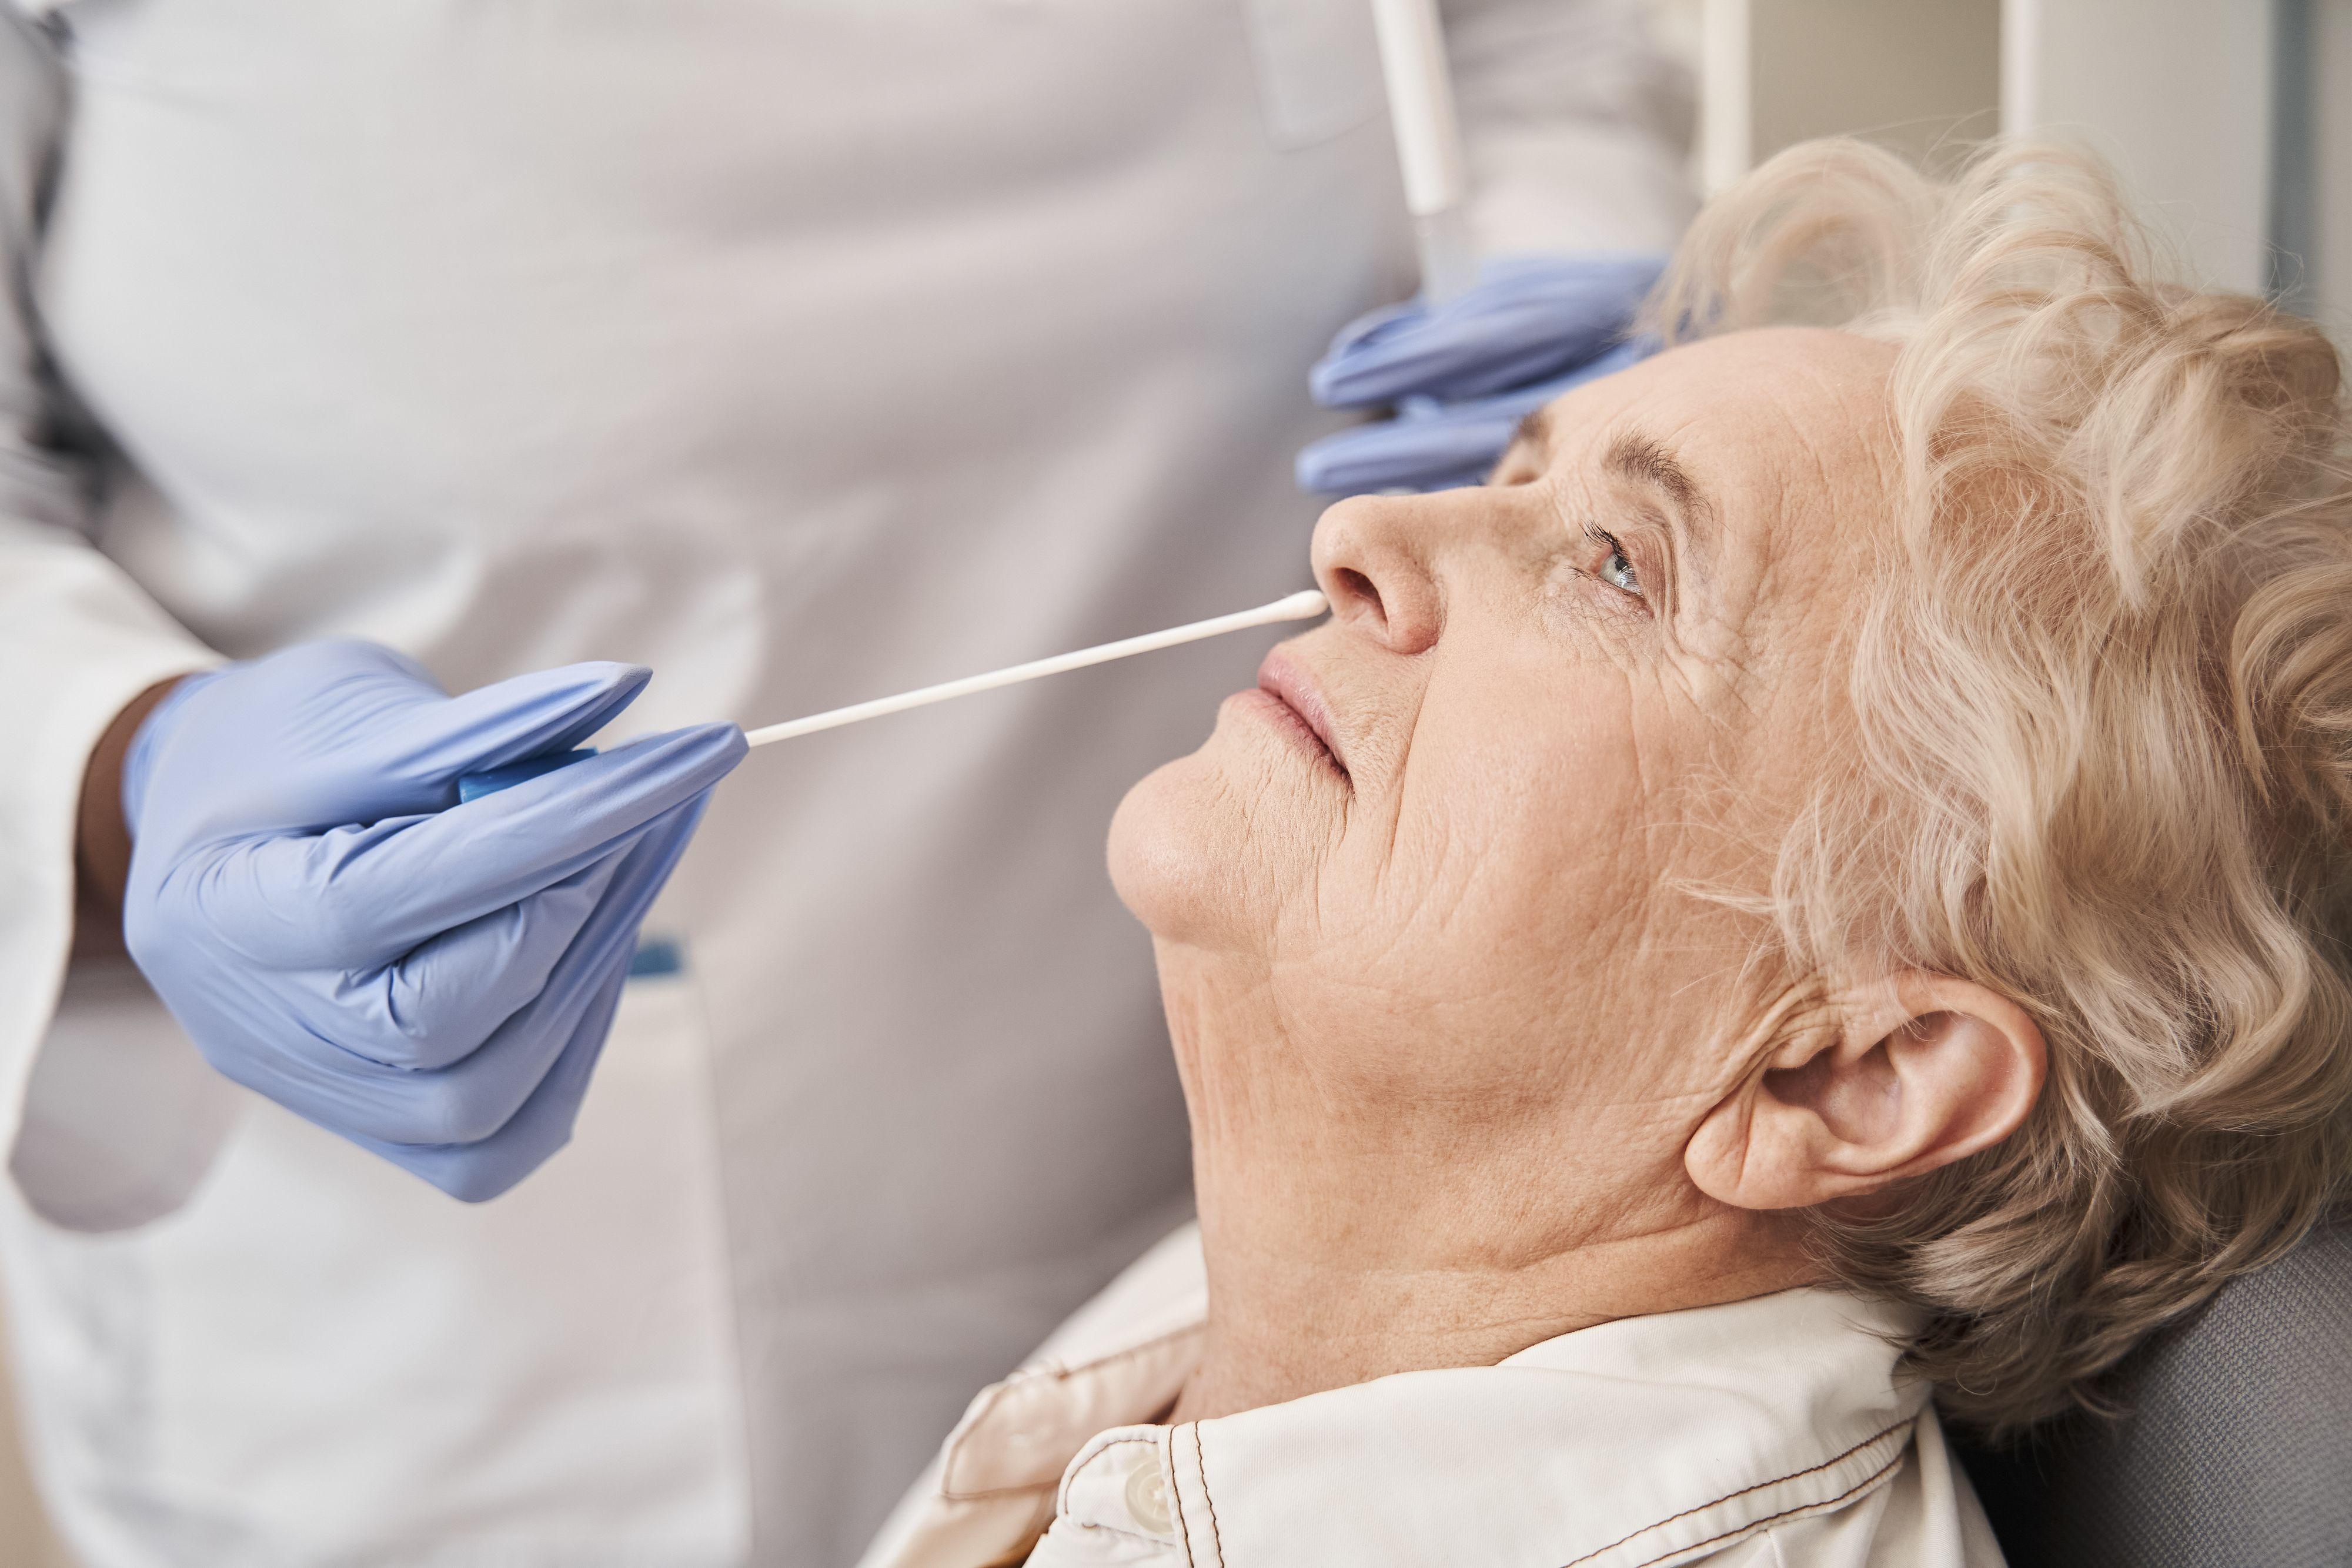 COVID, Strep, and Flu Testing